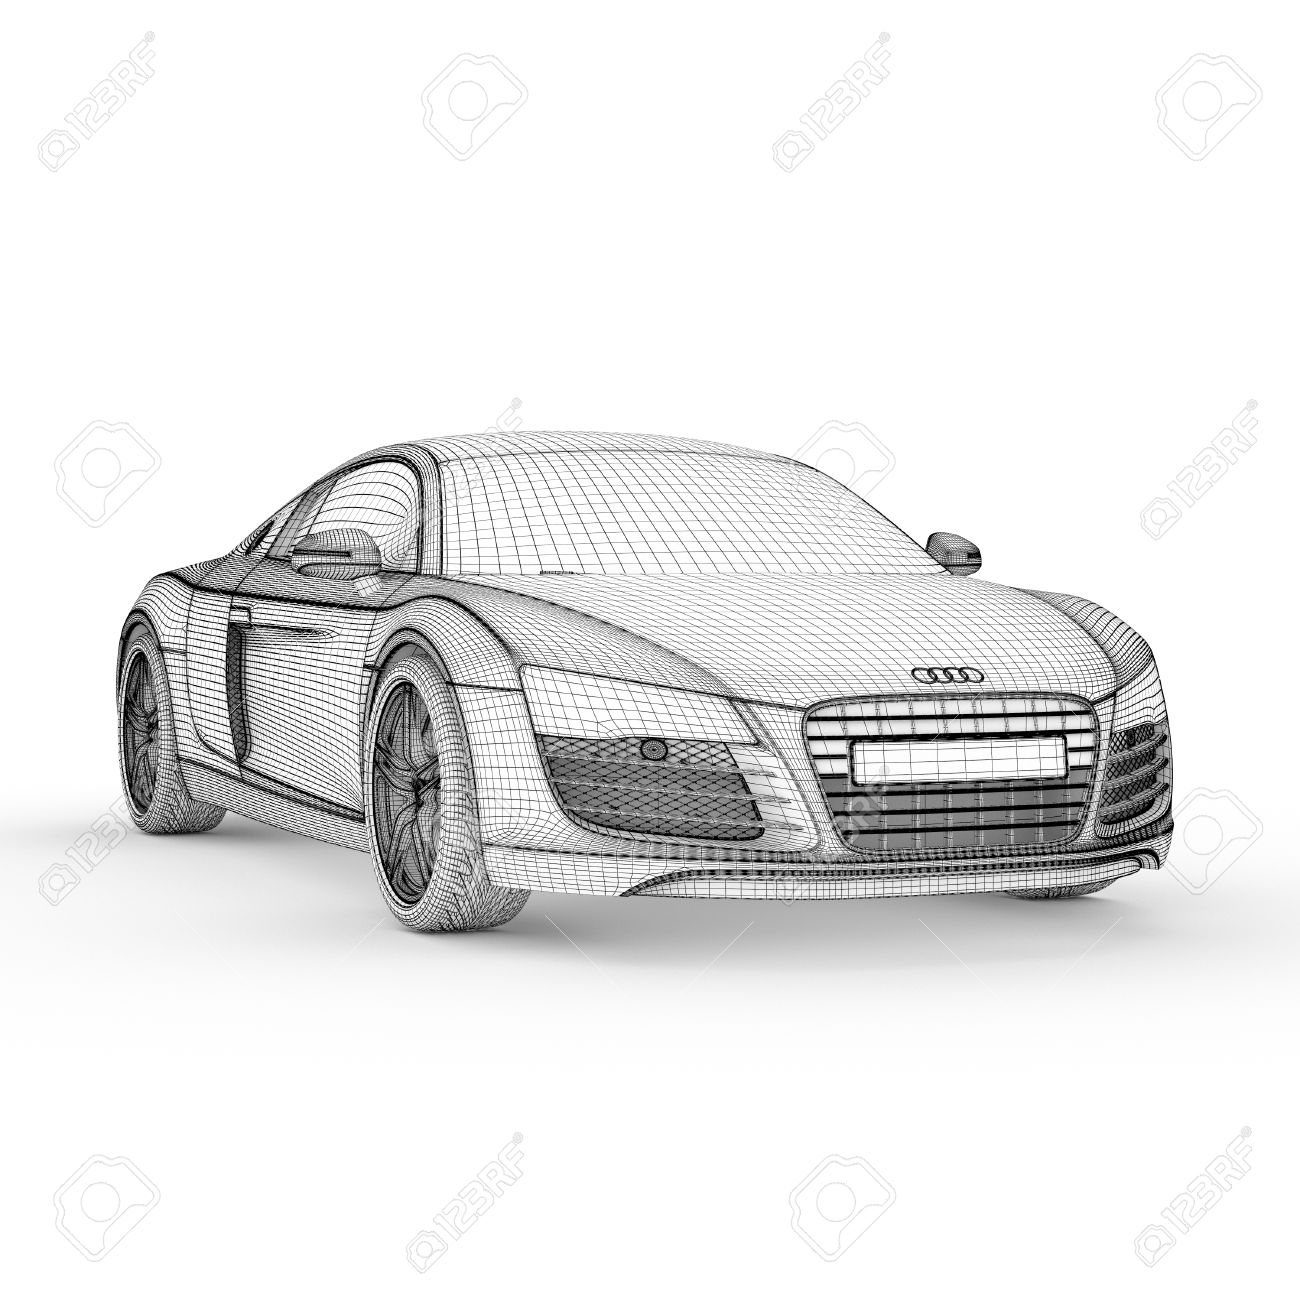 Car model drawing graphic design 3d illustration stock illustration 49982839